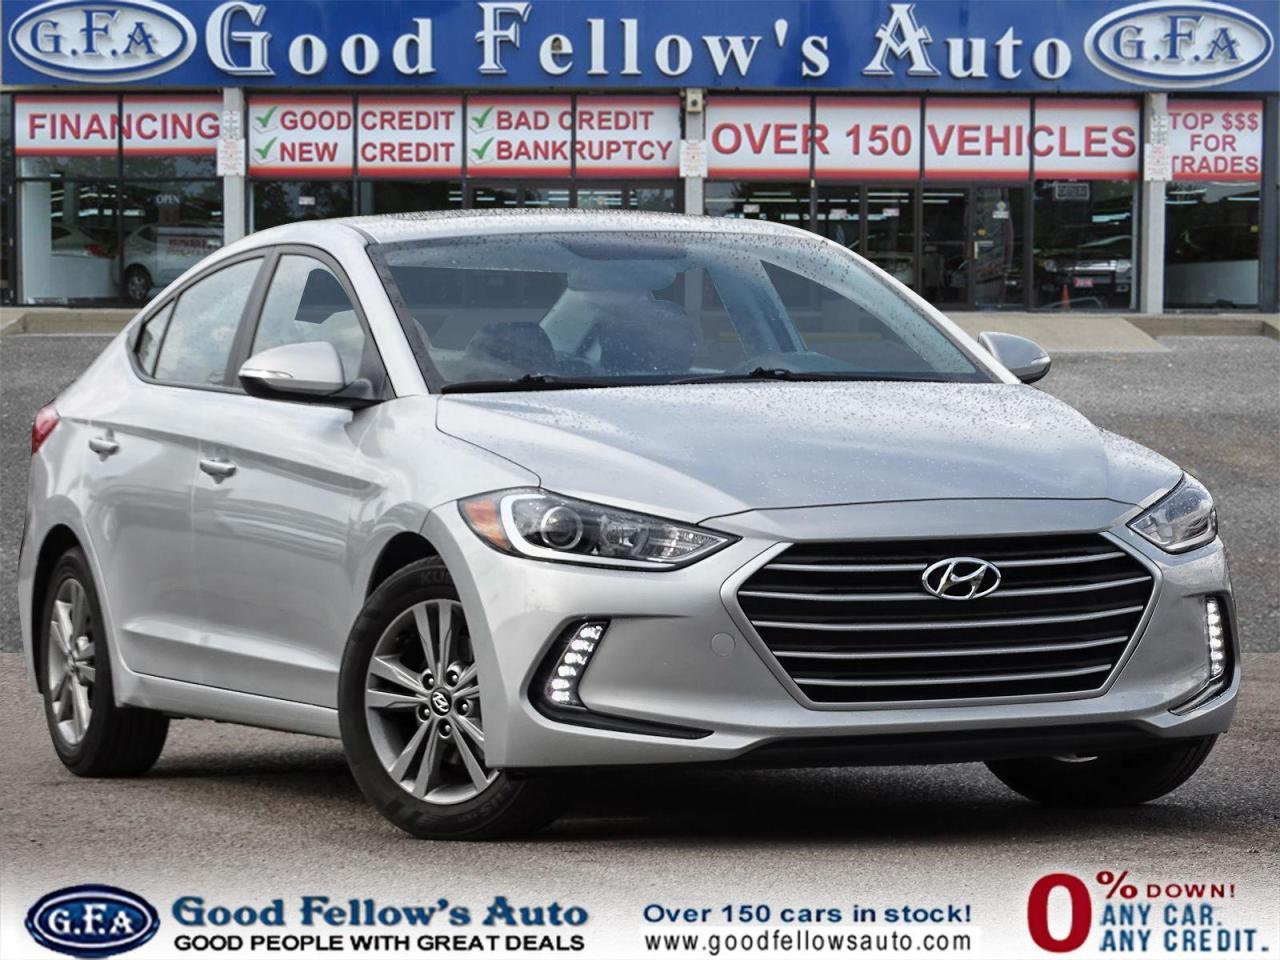 used 2018 Hyundai Elantra car, priced at $12,900